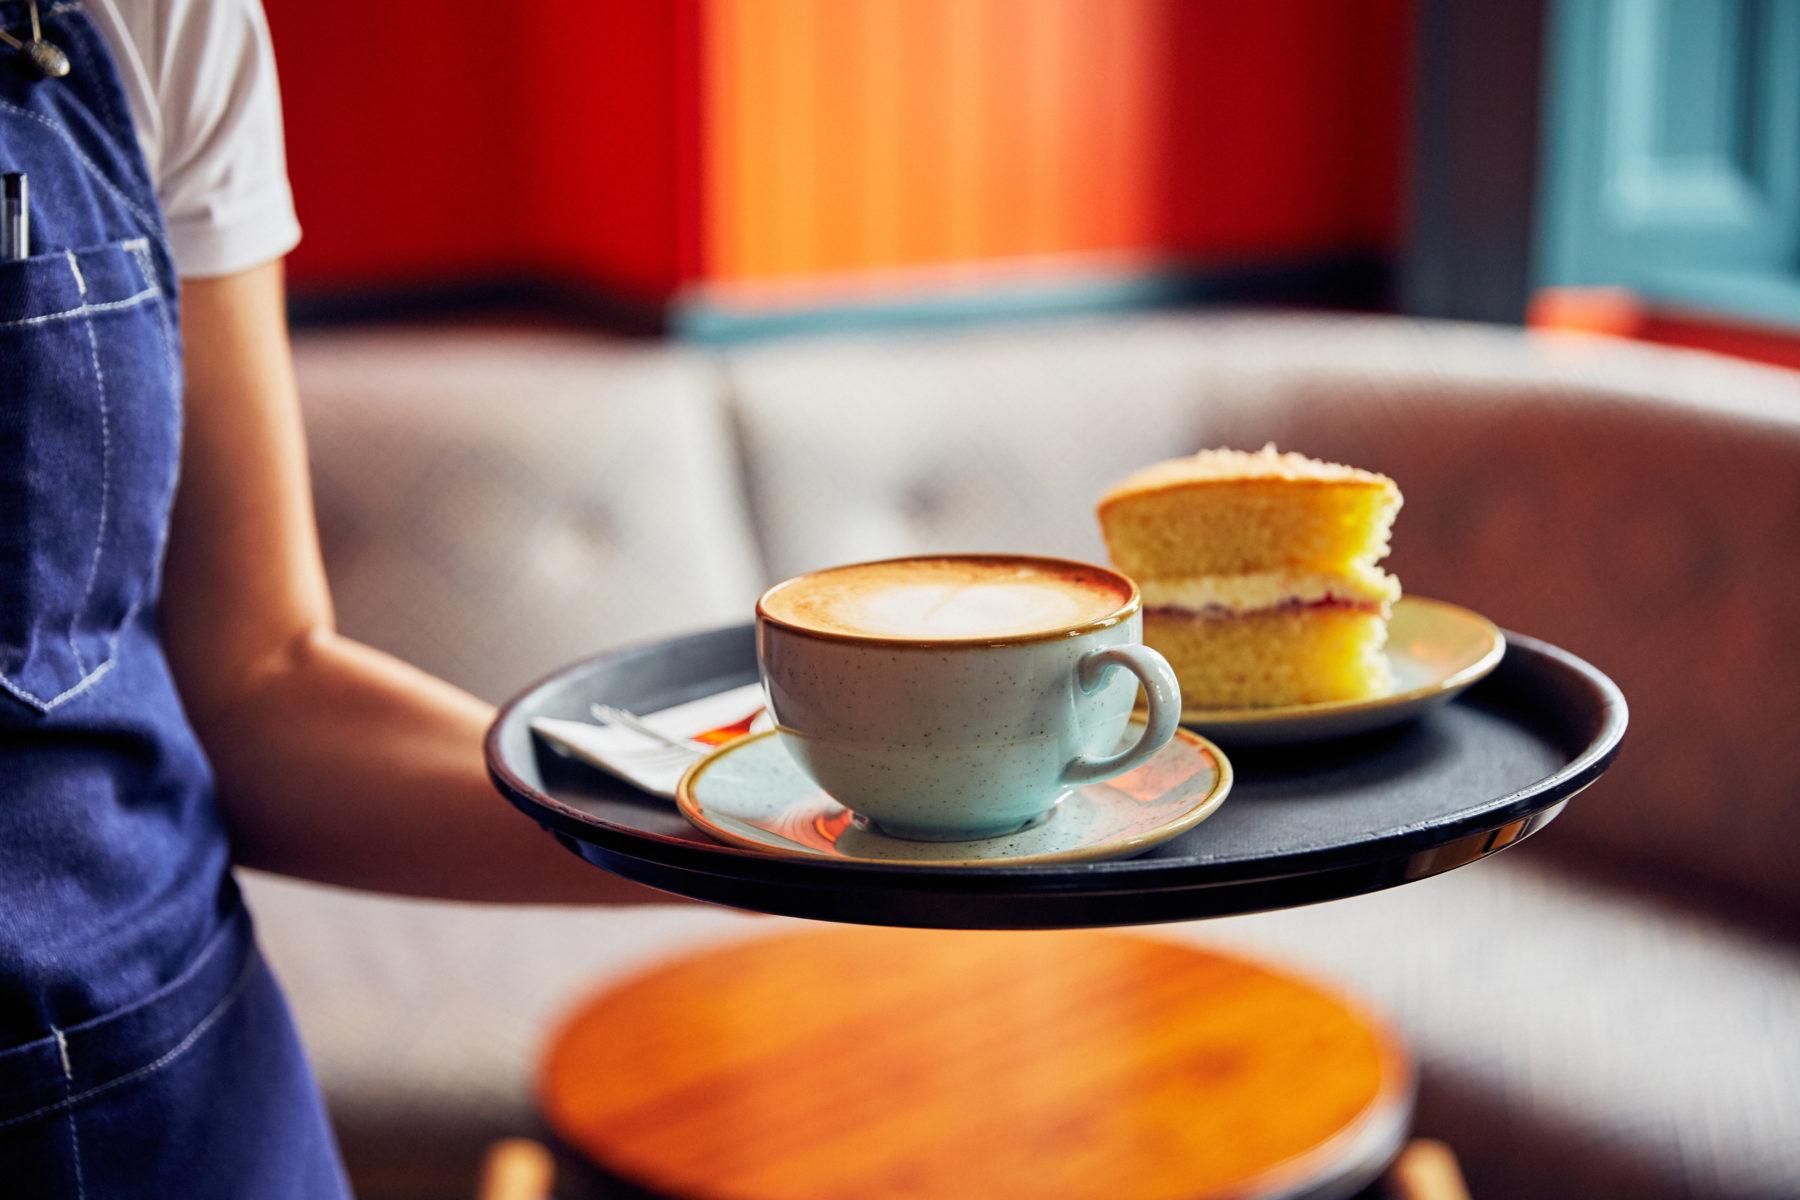 Fresh coffee and homemade cakes